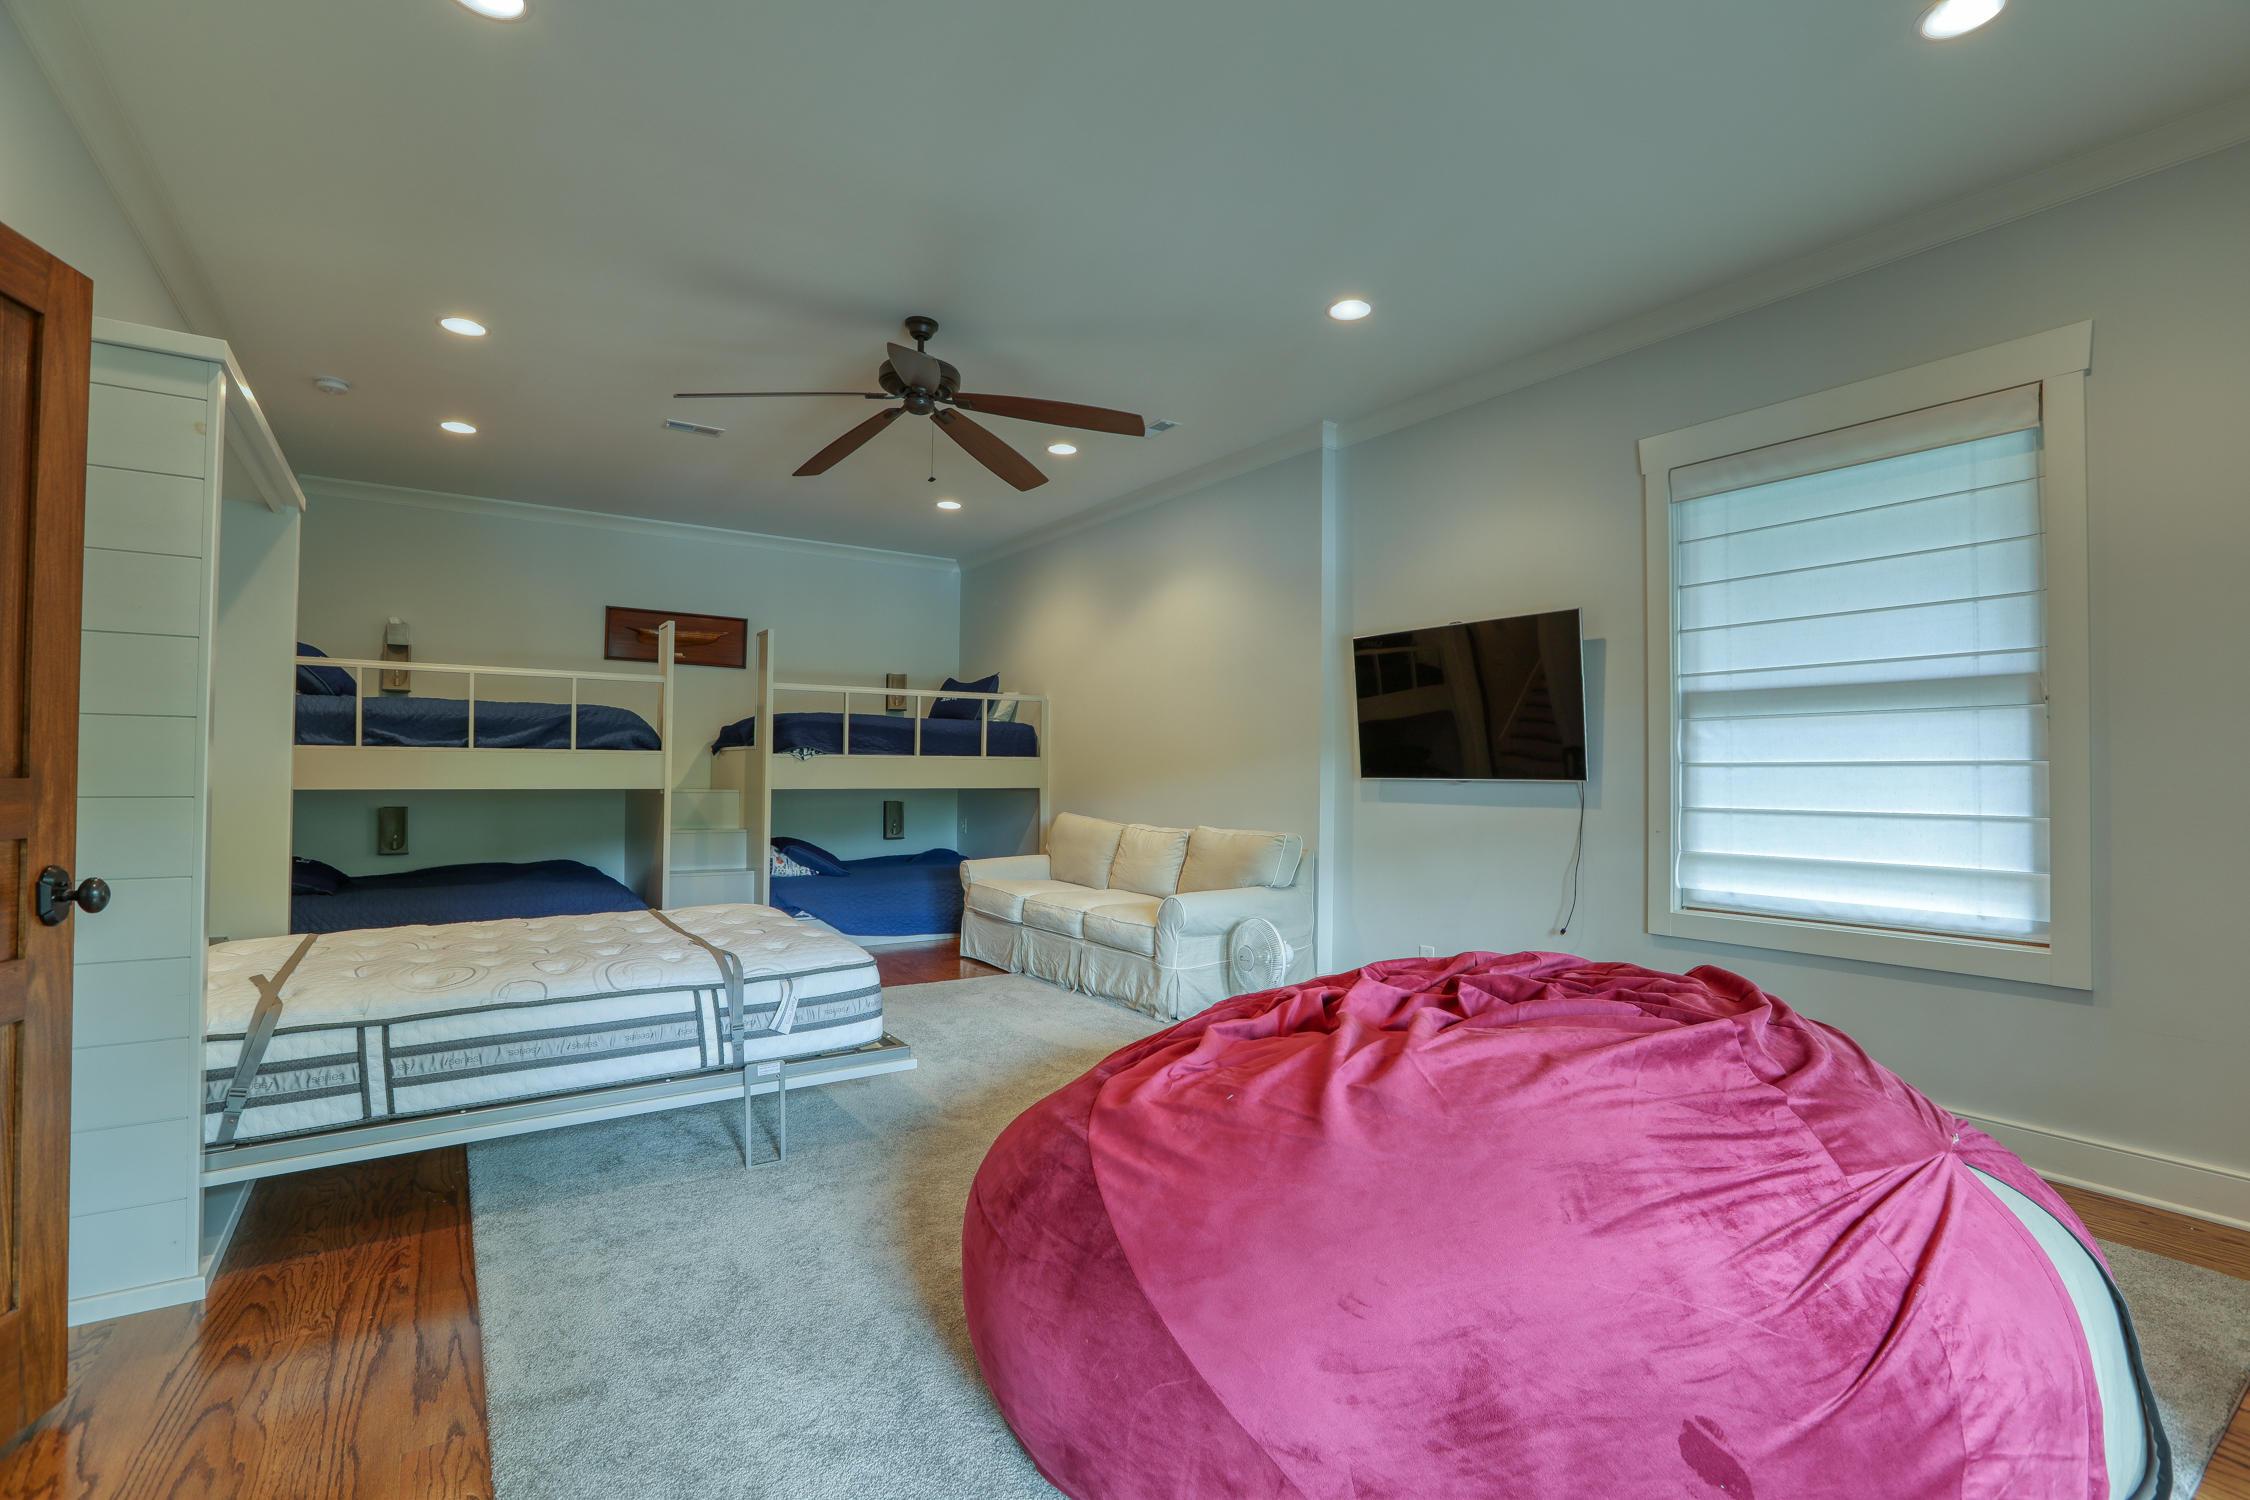 219 Yacht Club Lane: